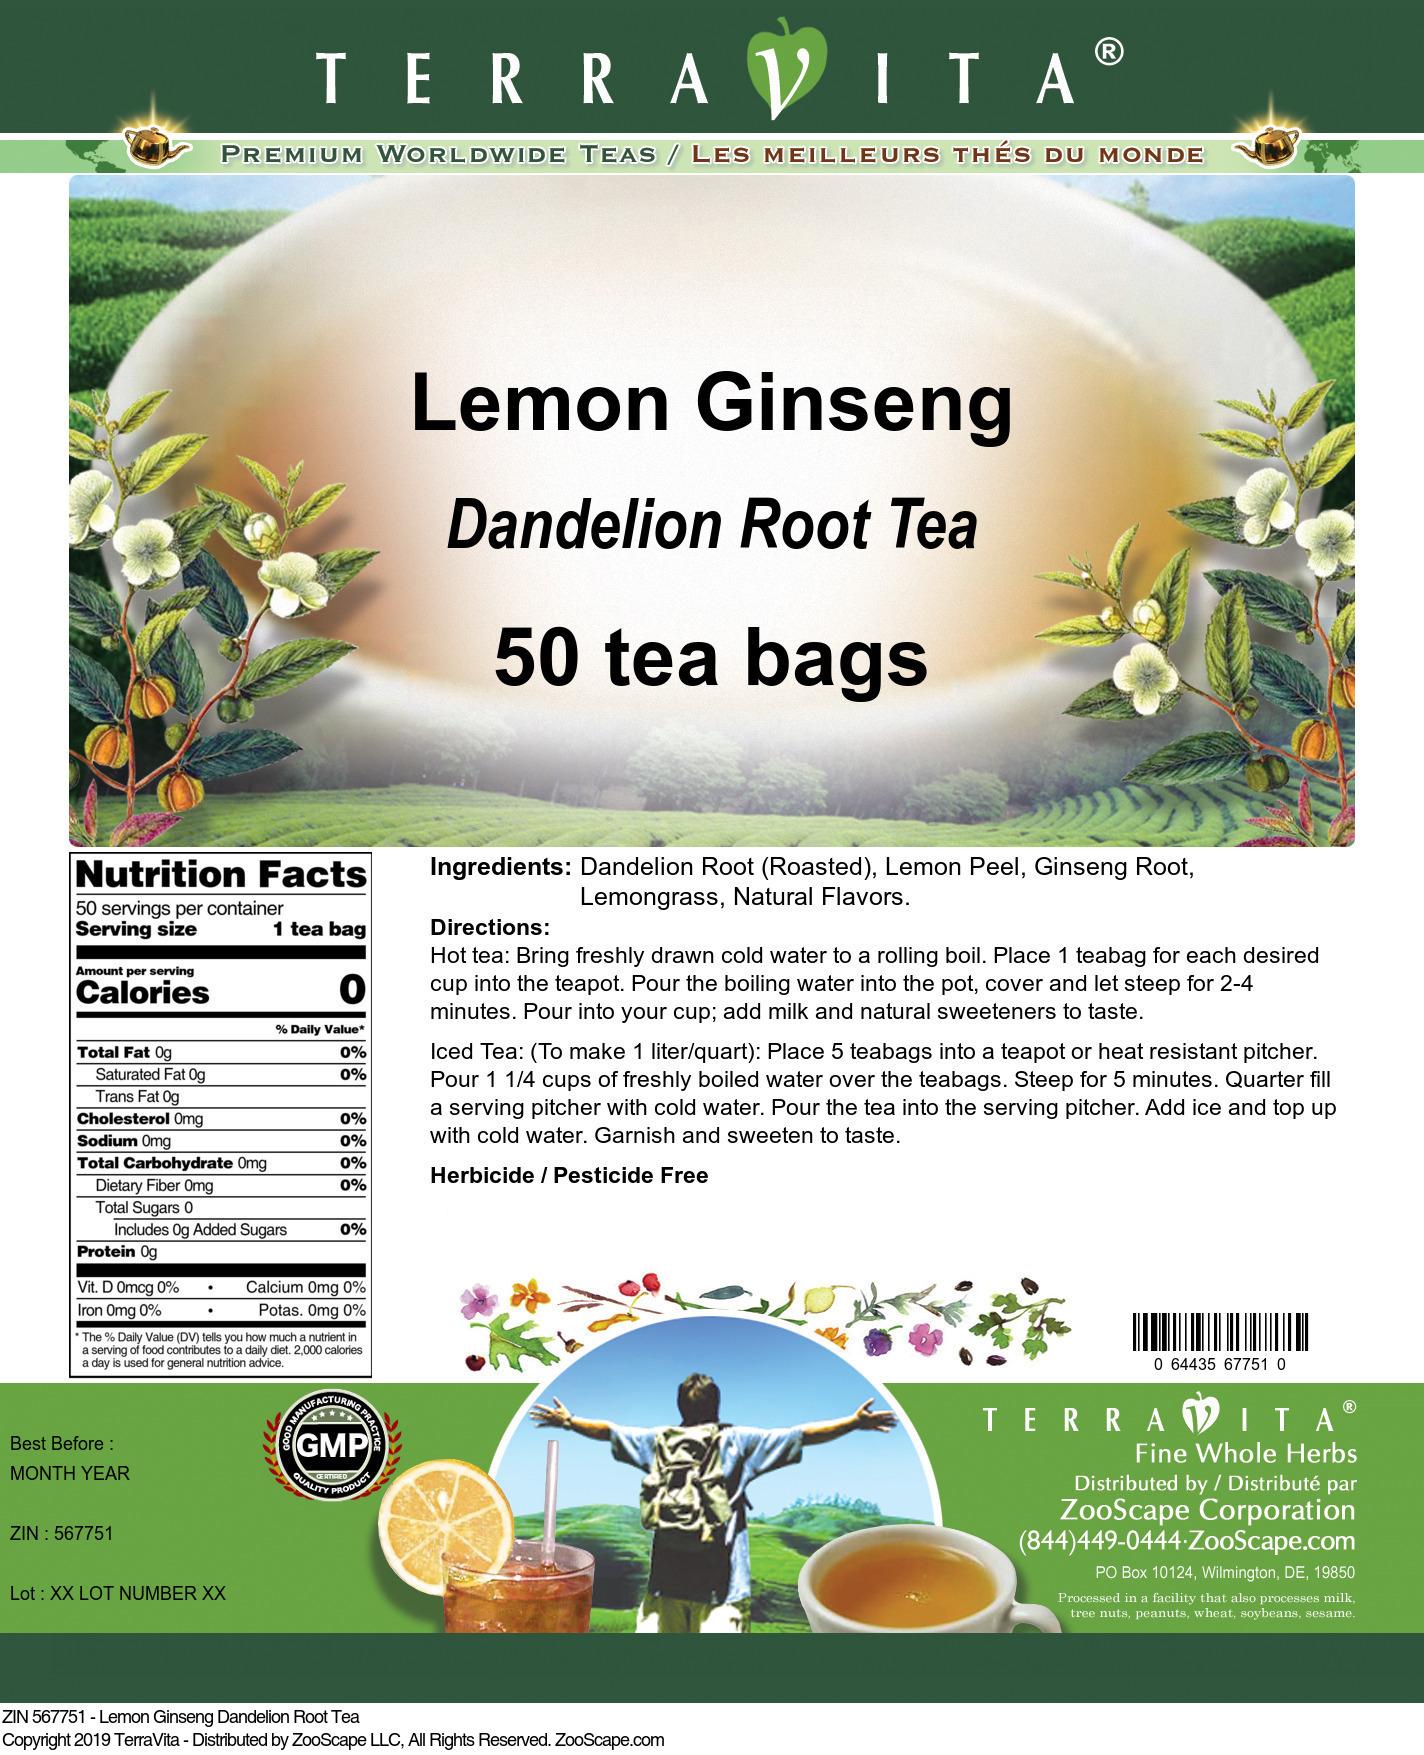 Lemon Ginseng Dandelion Root Tea